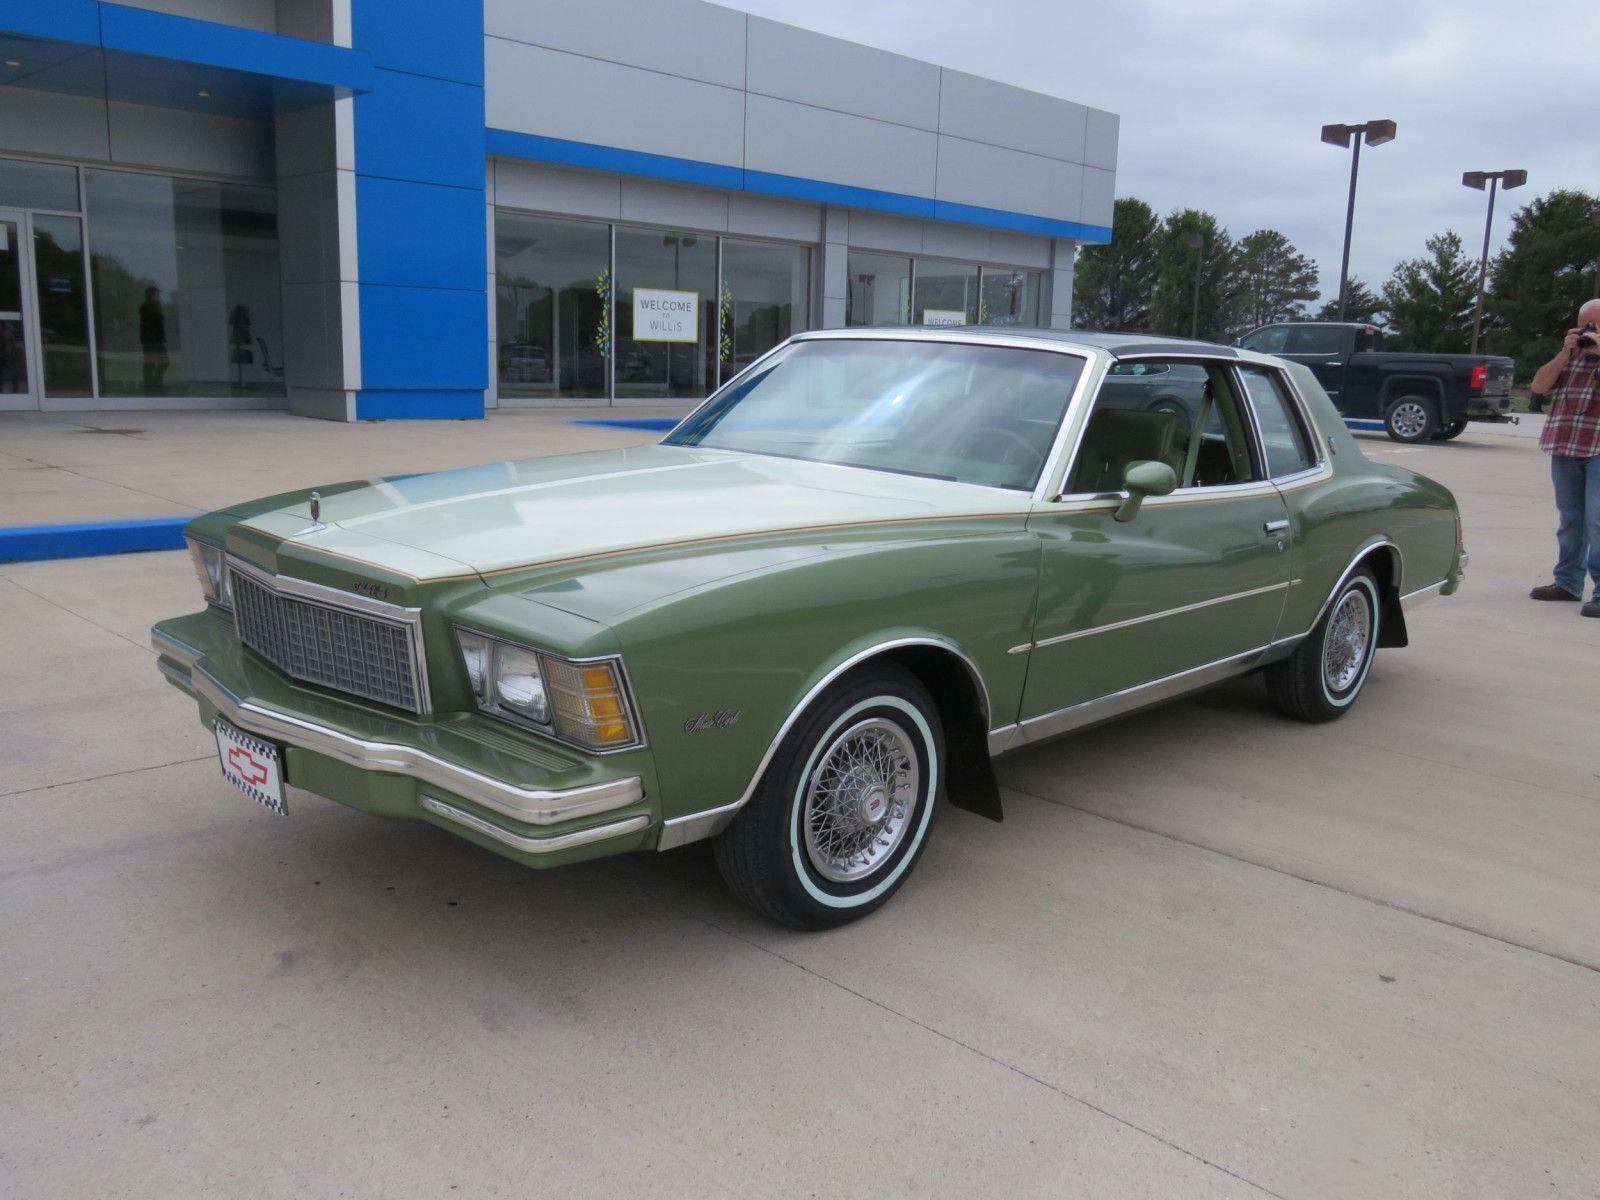 "<img src=""1979-monte-carlo.jpg"" alt=""A 1979 Chevrolet Monte Carlo T-Top Coupe"">"